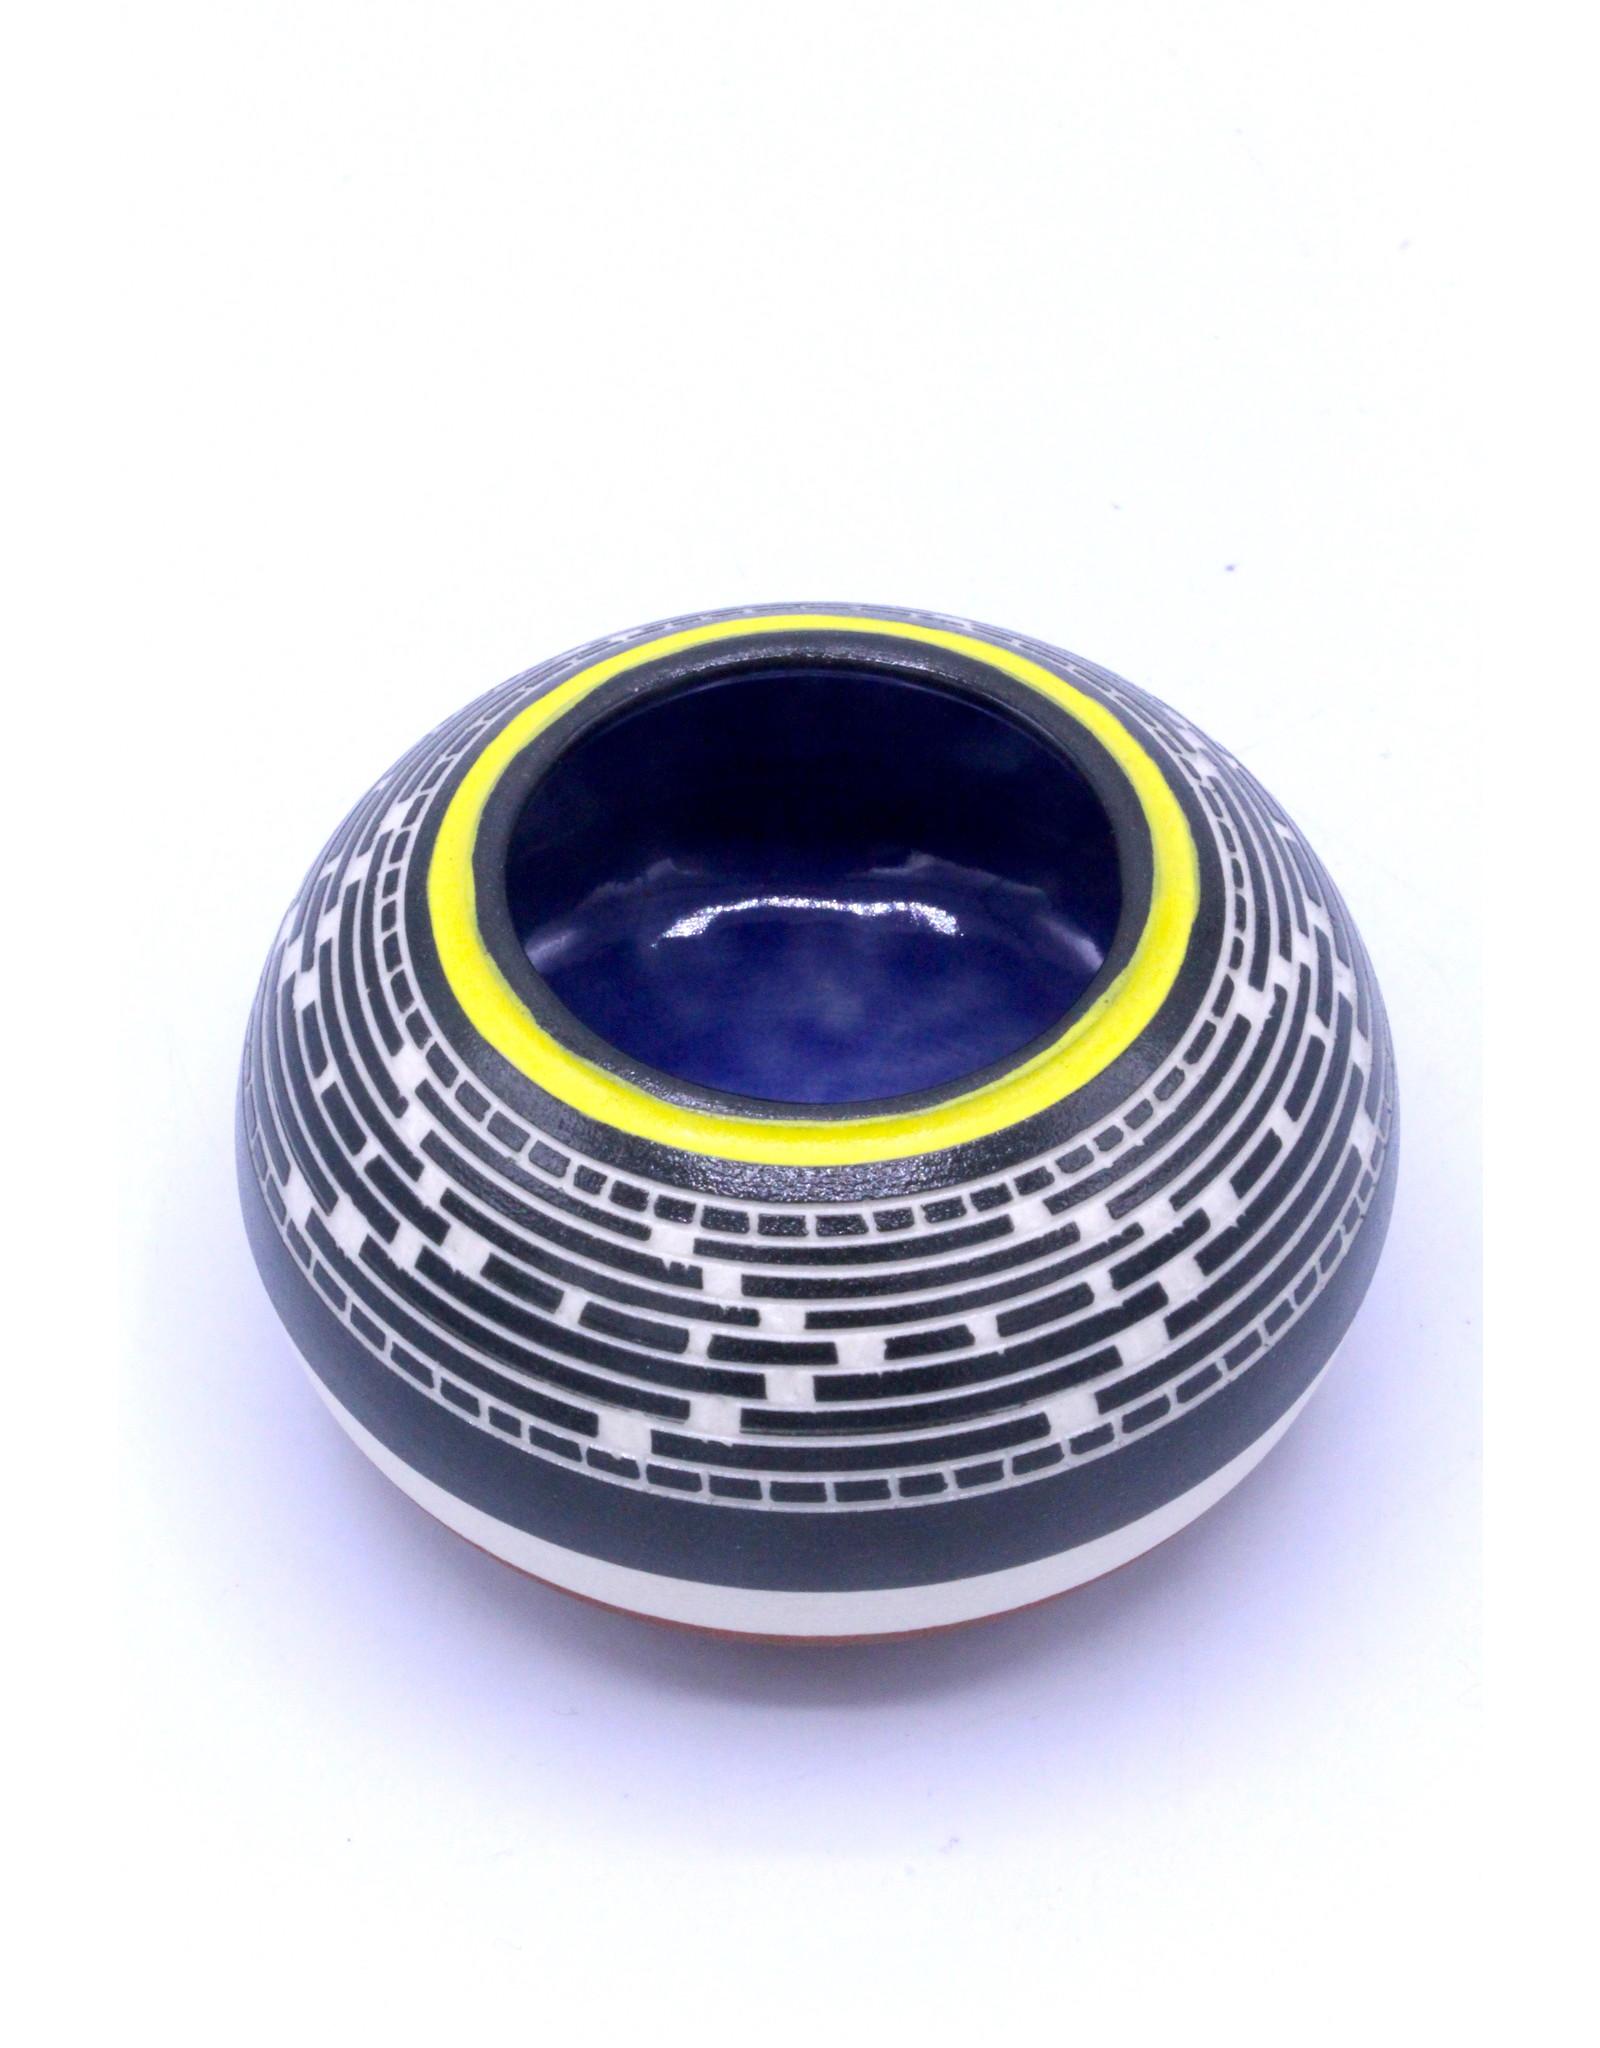 Pottery - #0064